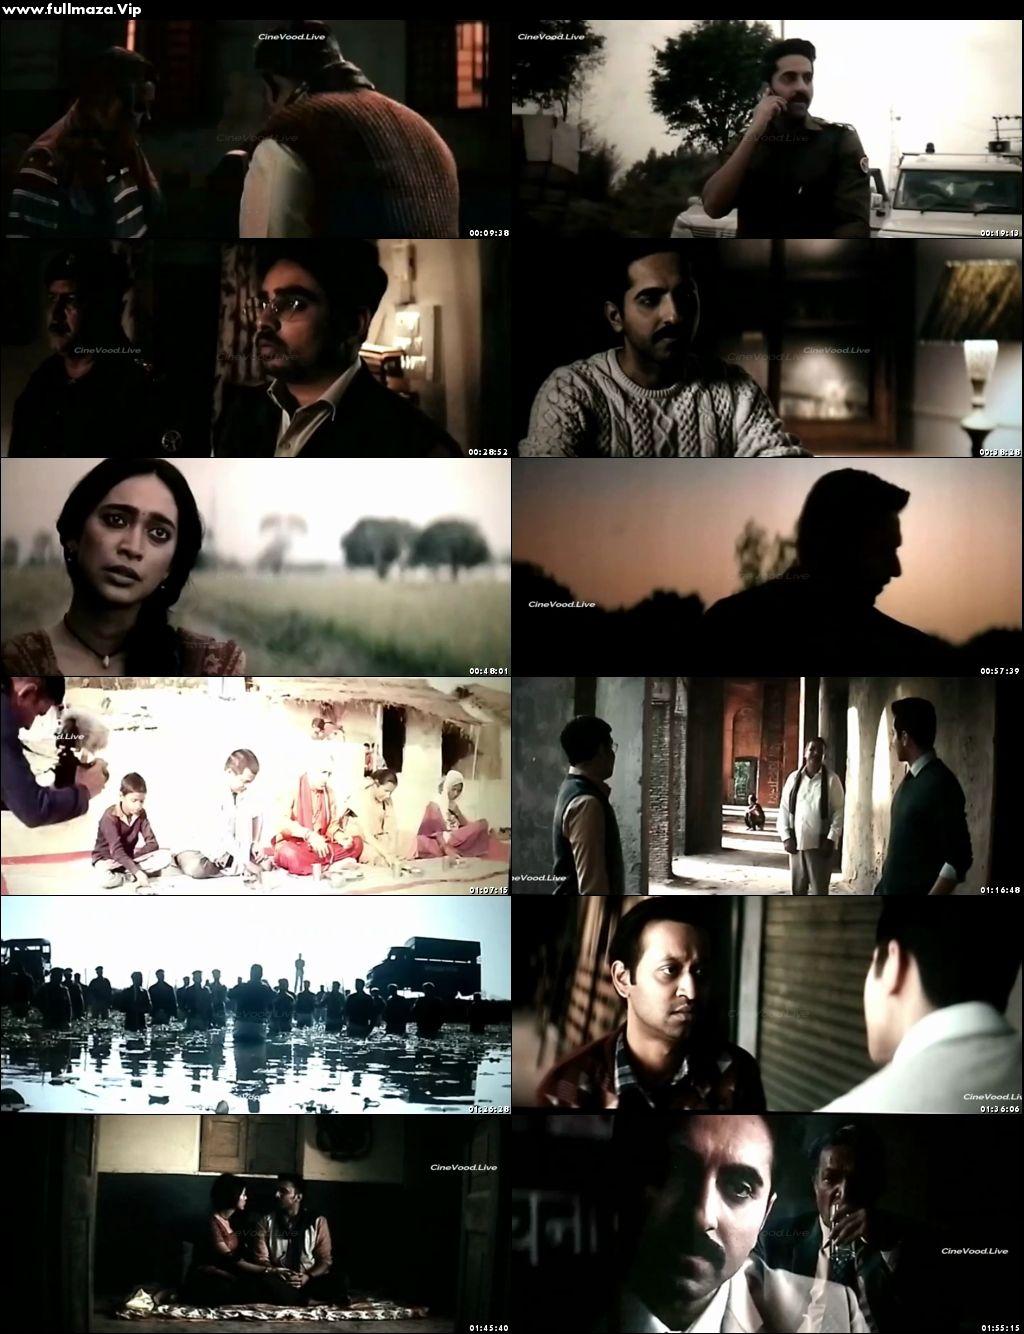 fullmoviedownload hd: Article 15 (2019) Hindi Movie HDRip | 720p | 480p